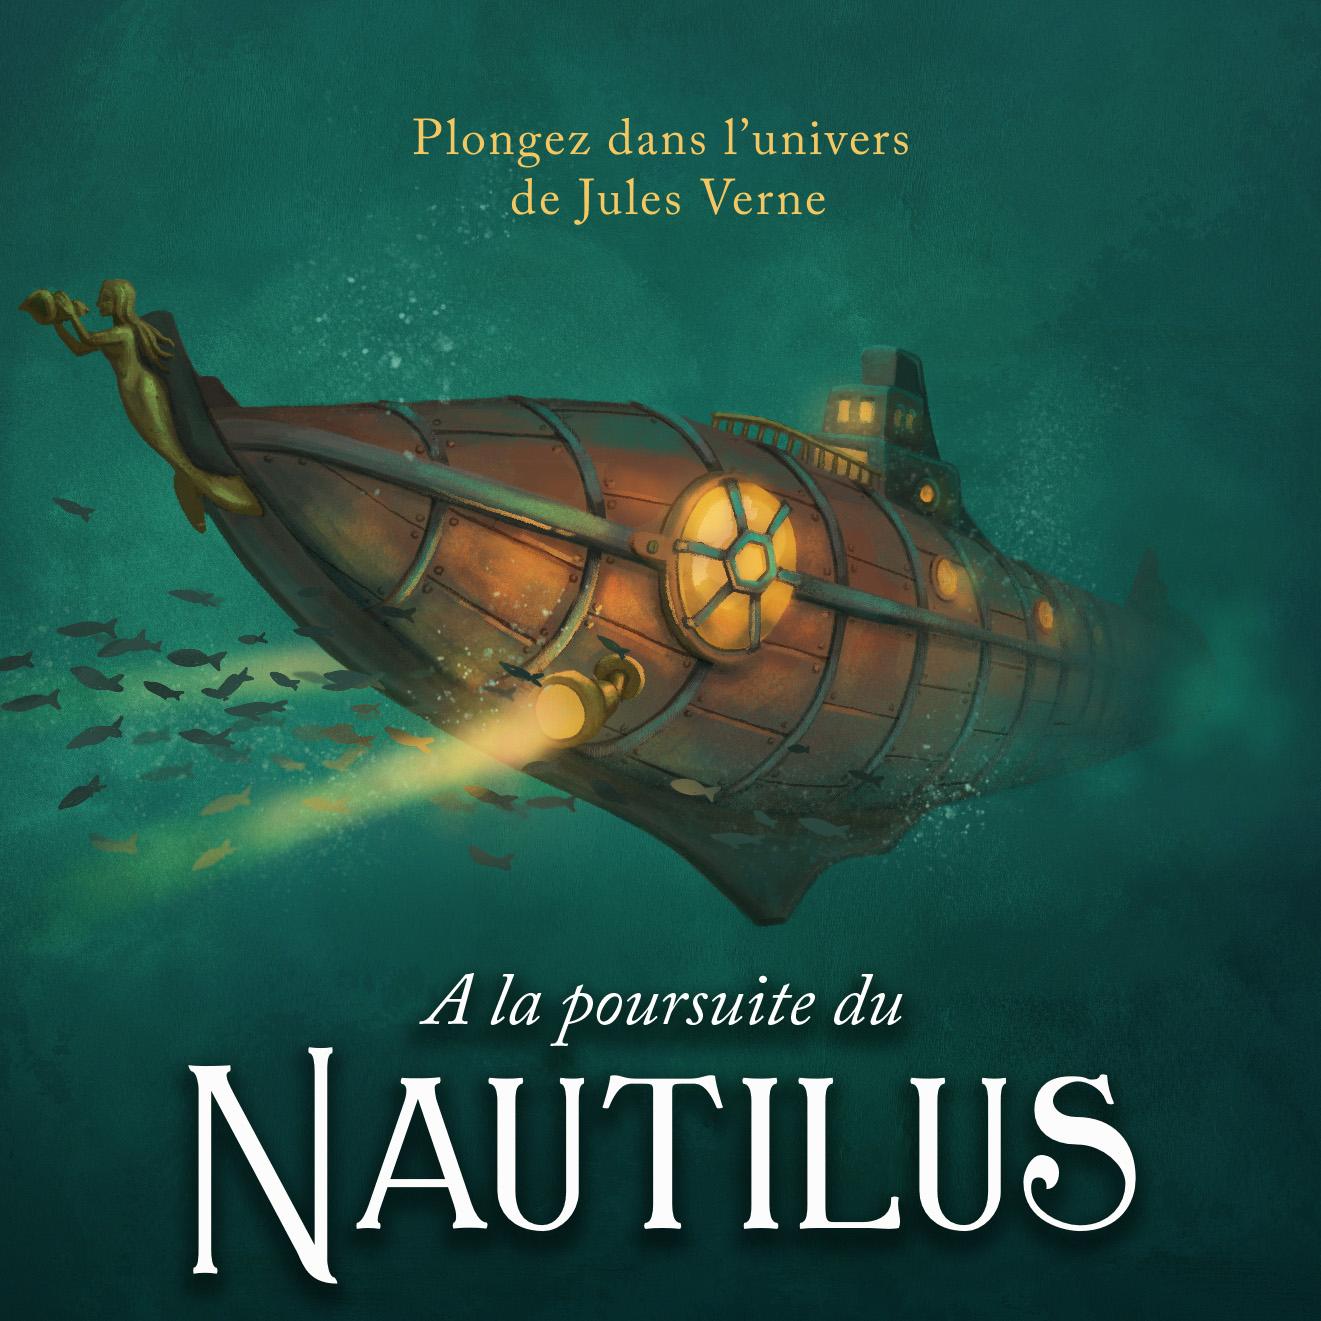 [Pré-commande] Escape game interactif Adios Casa À la Poursuite du Nautilus (scénario + flyer) - Adios-Casa.com